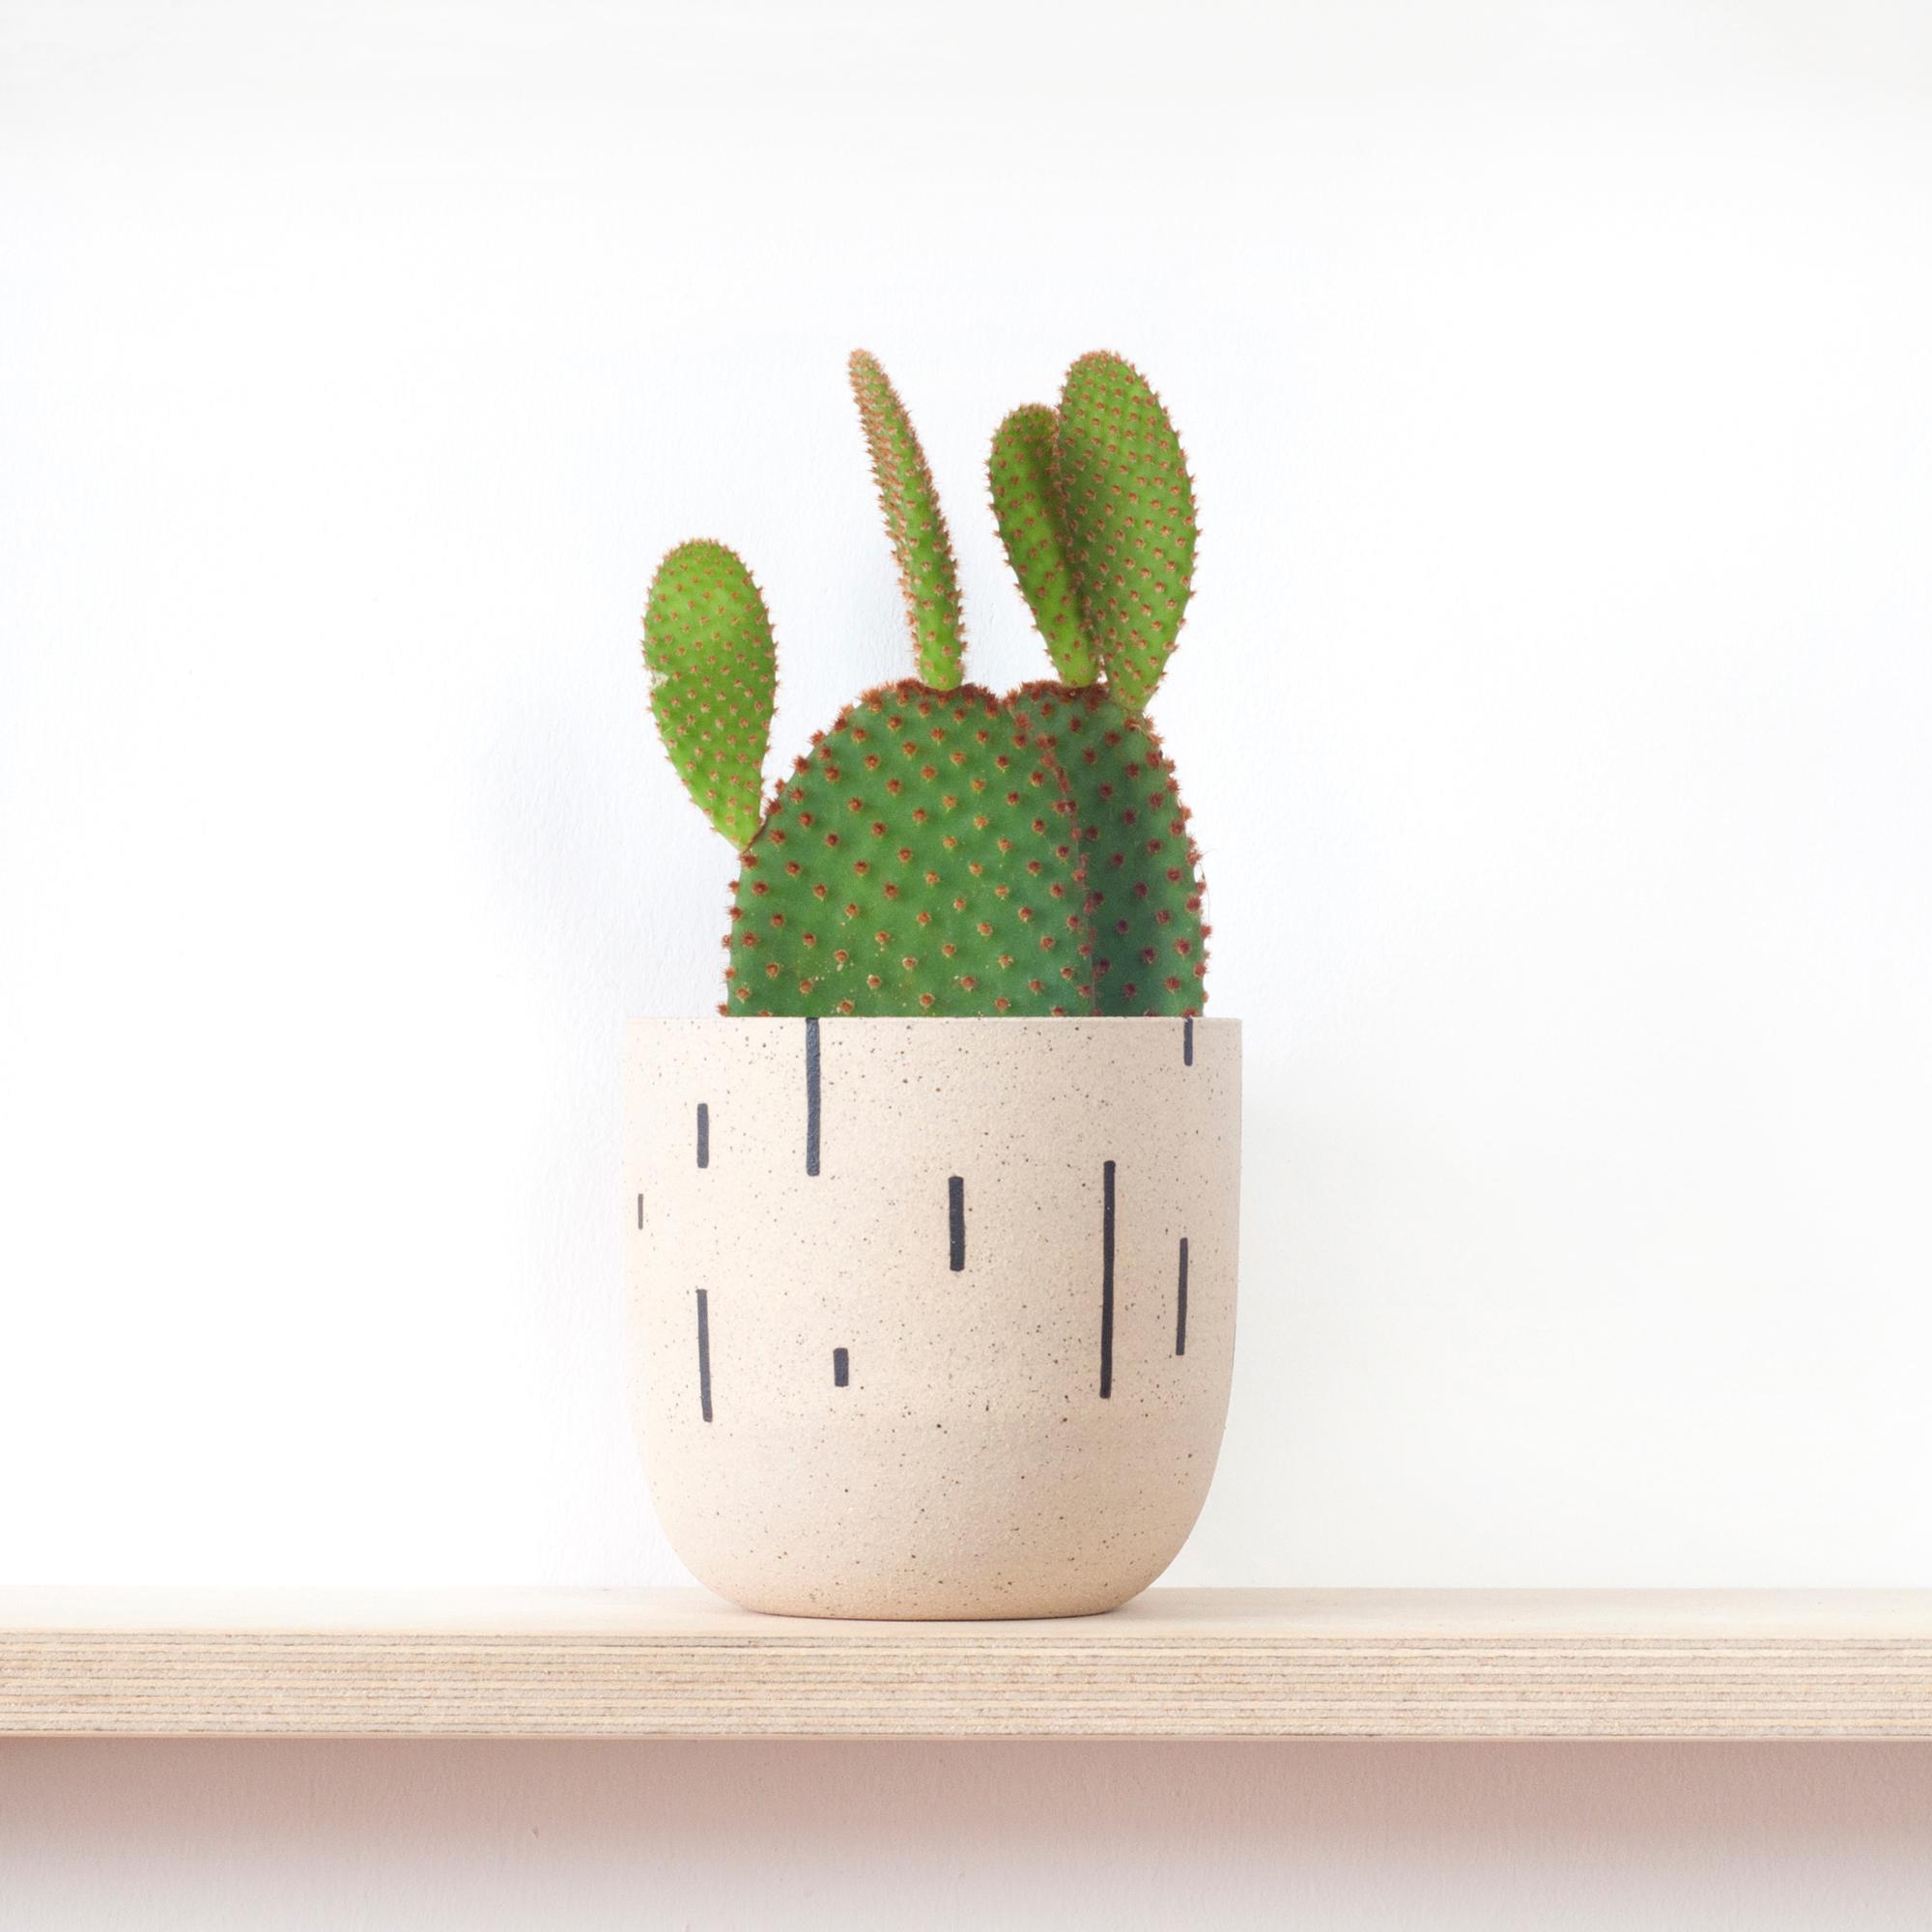 5-plantpot-tillyhemingway-web.jpg